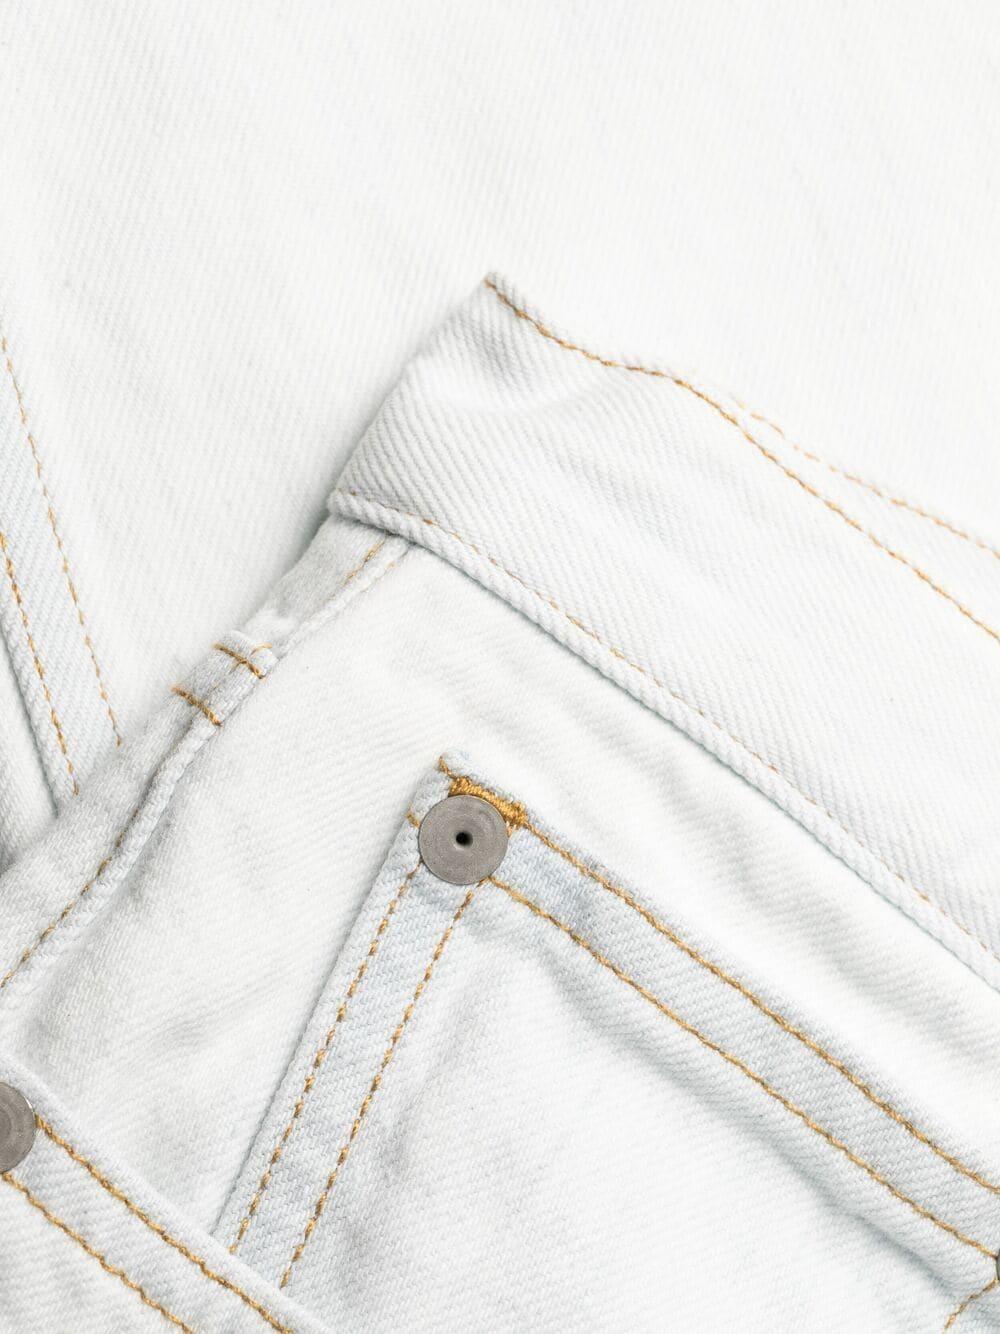 Maison Margiela maison margiela jeans uomo MAISON MARGIELA | Jeans | S50LA0178 S30736962